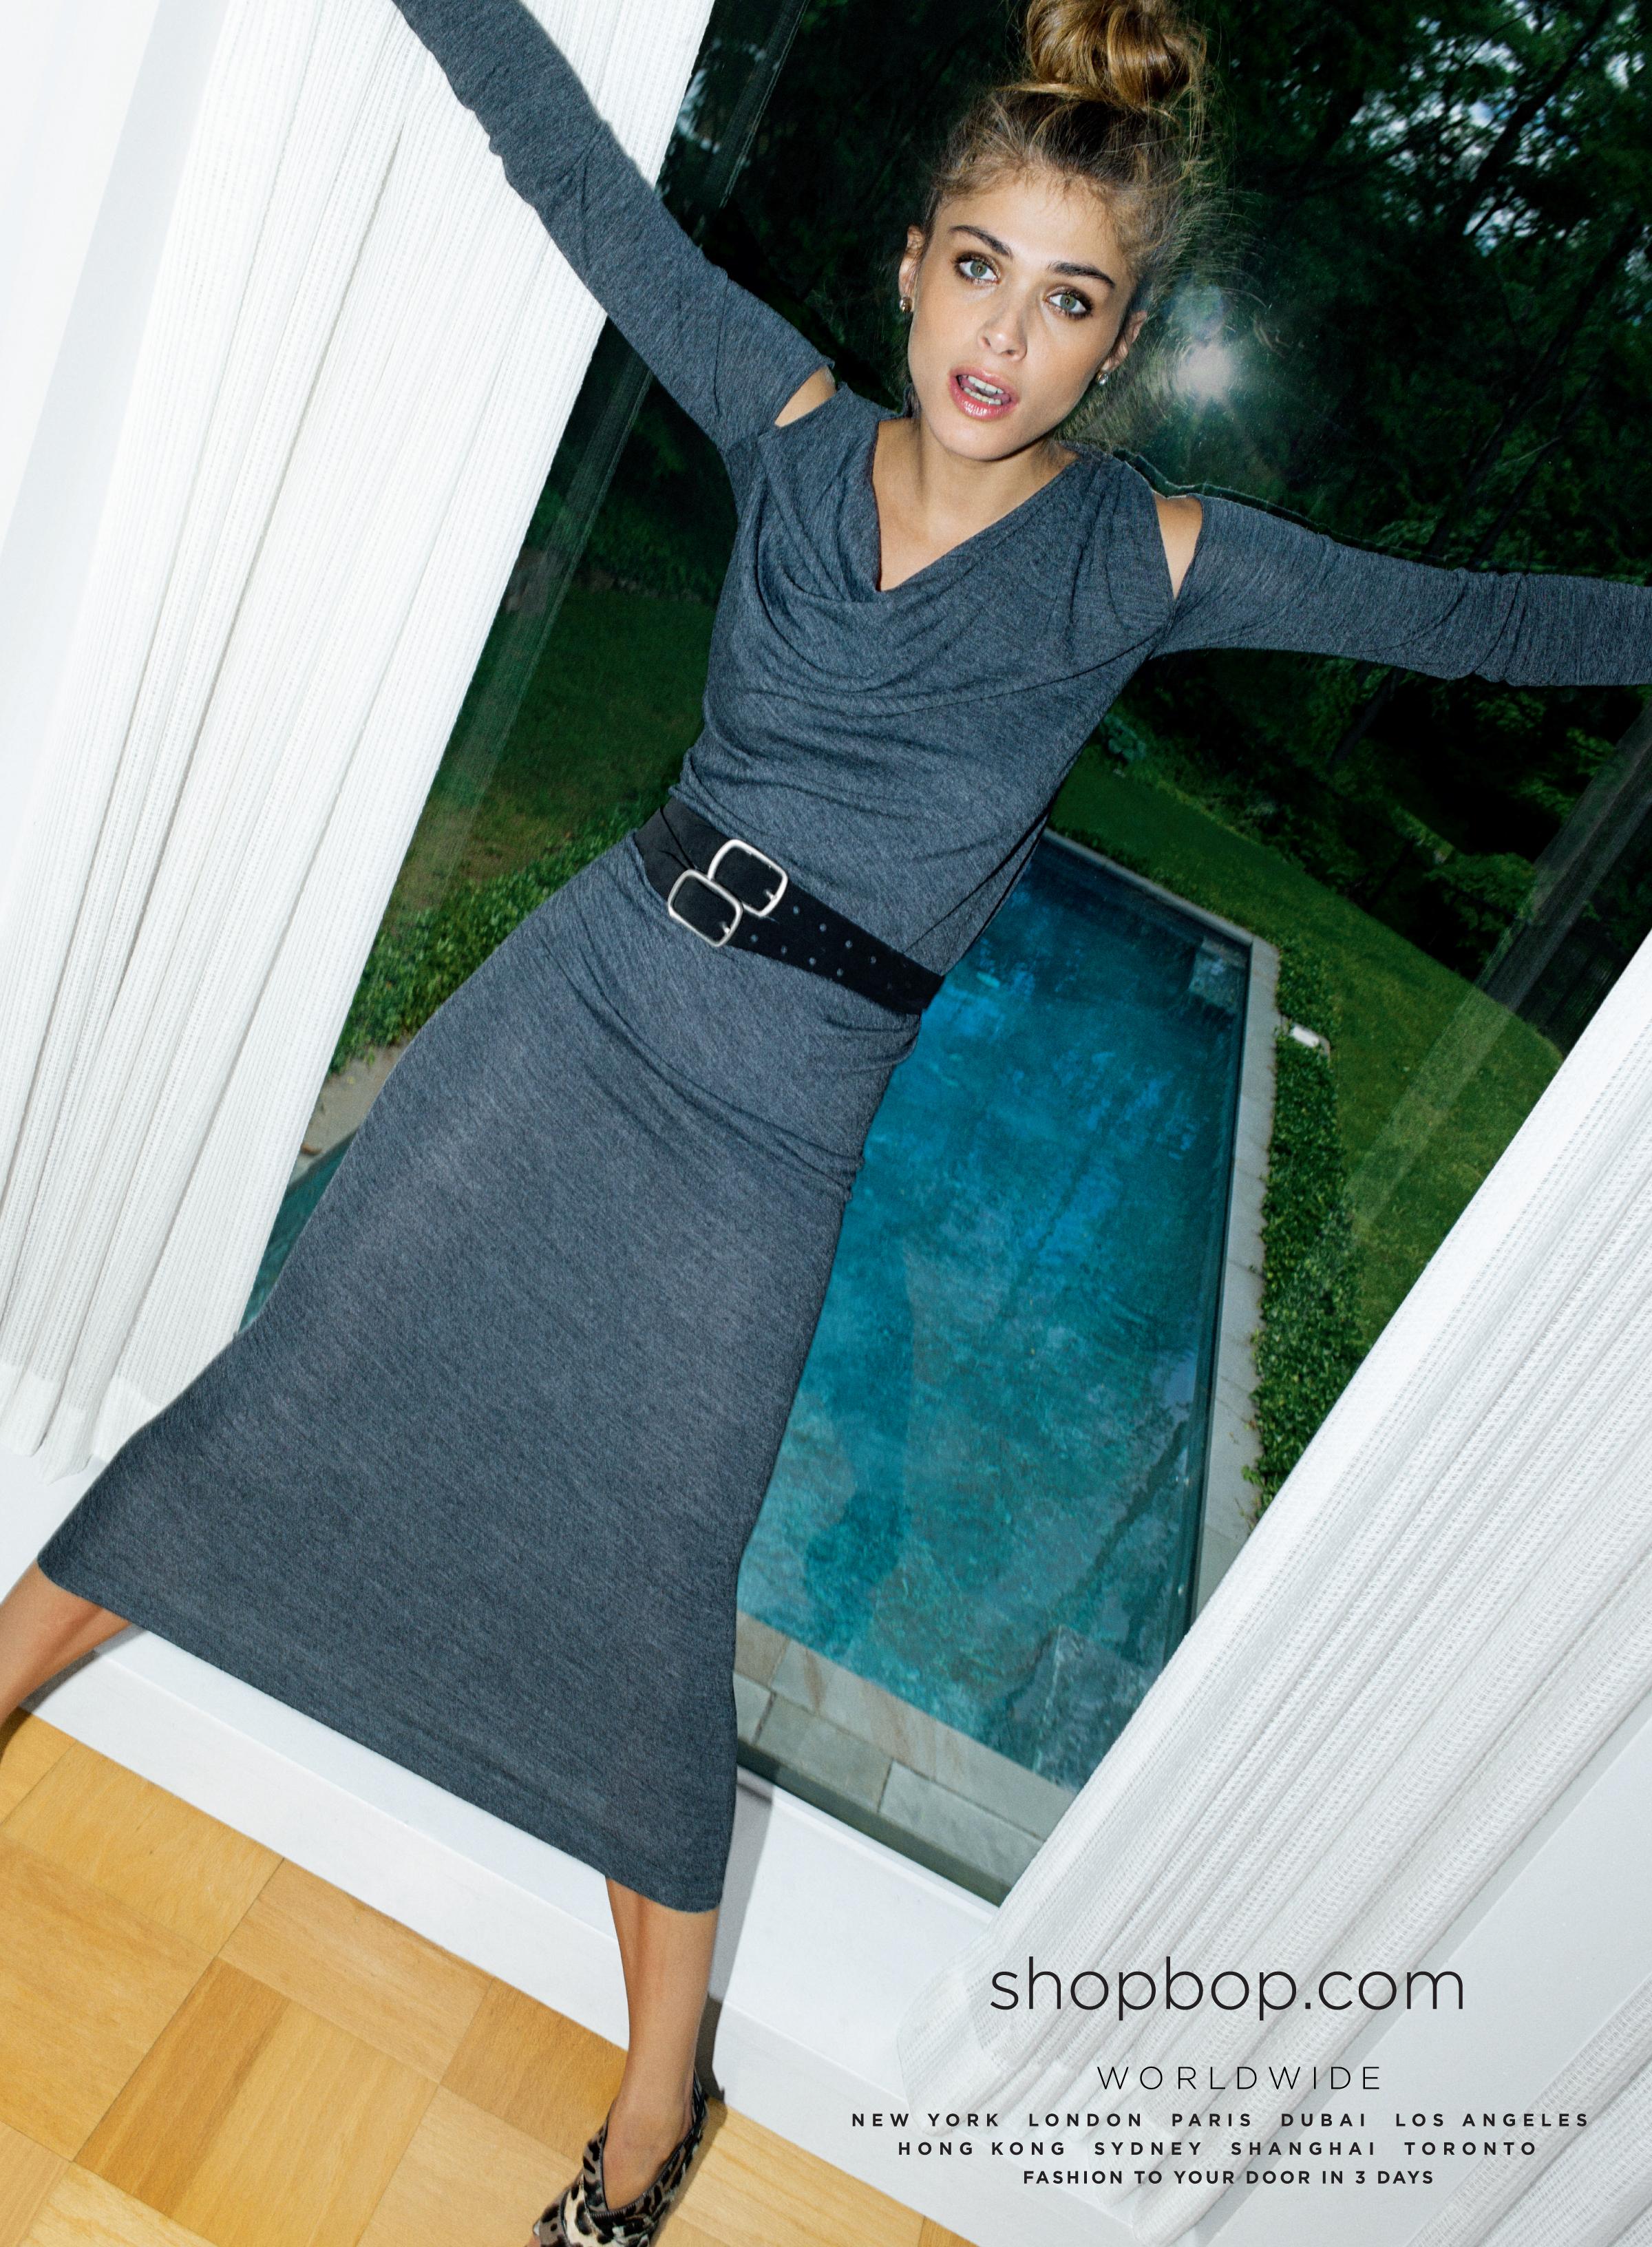 Elisa Sednaoui for Shopbop Fall 2011